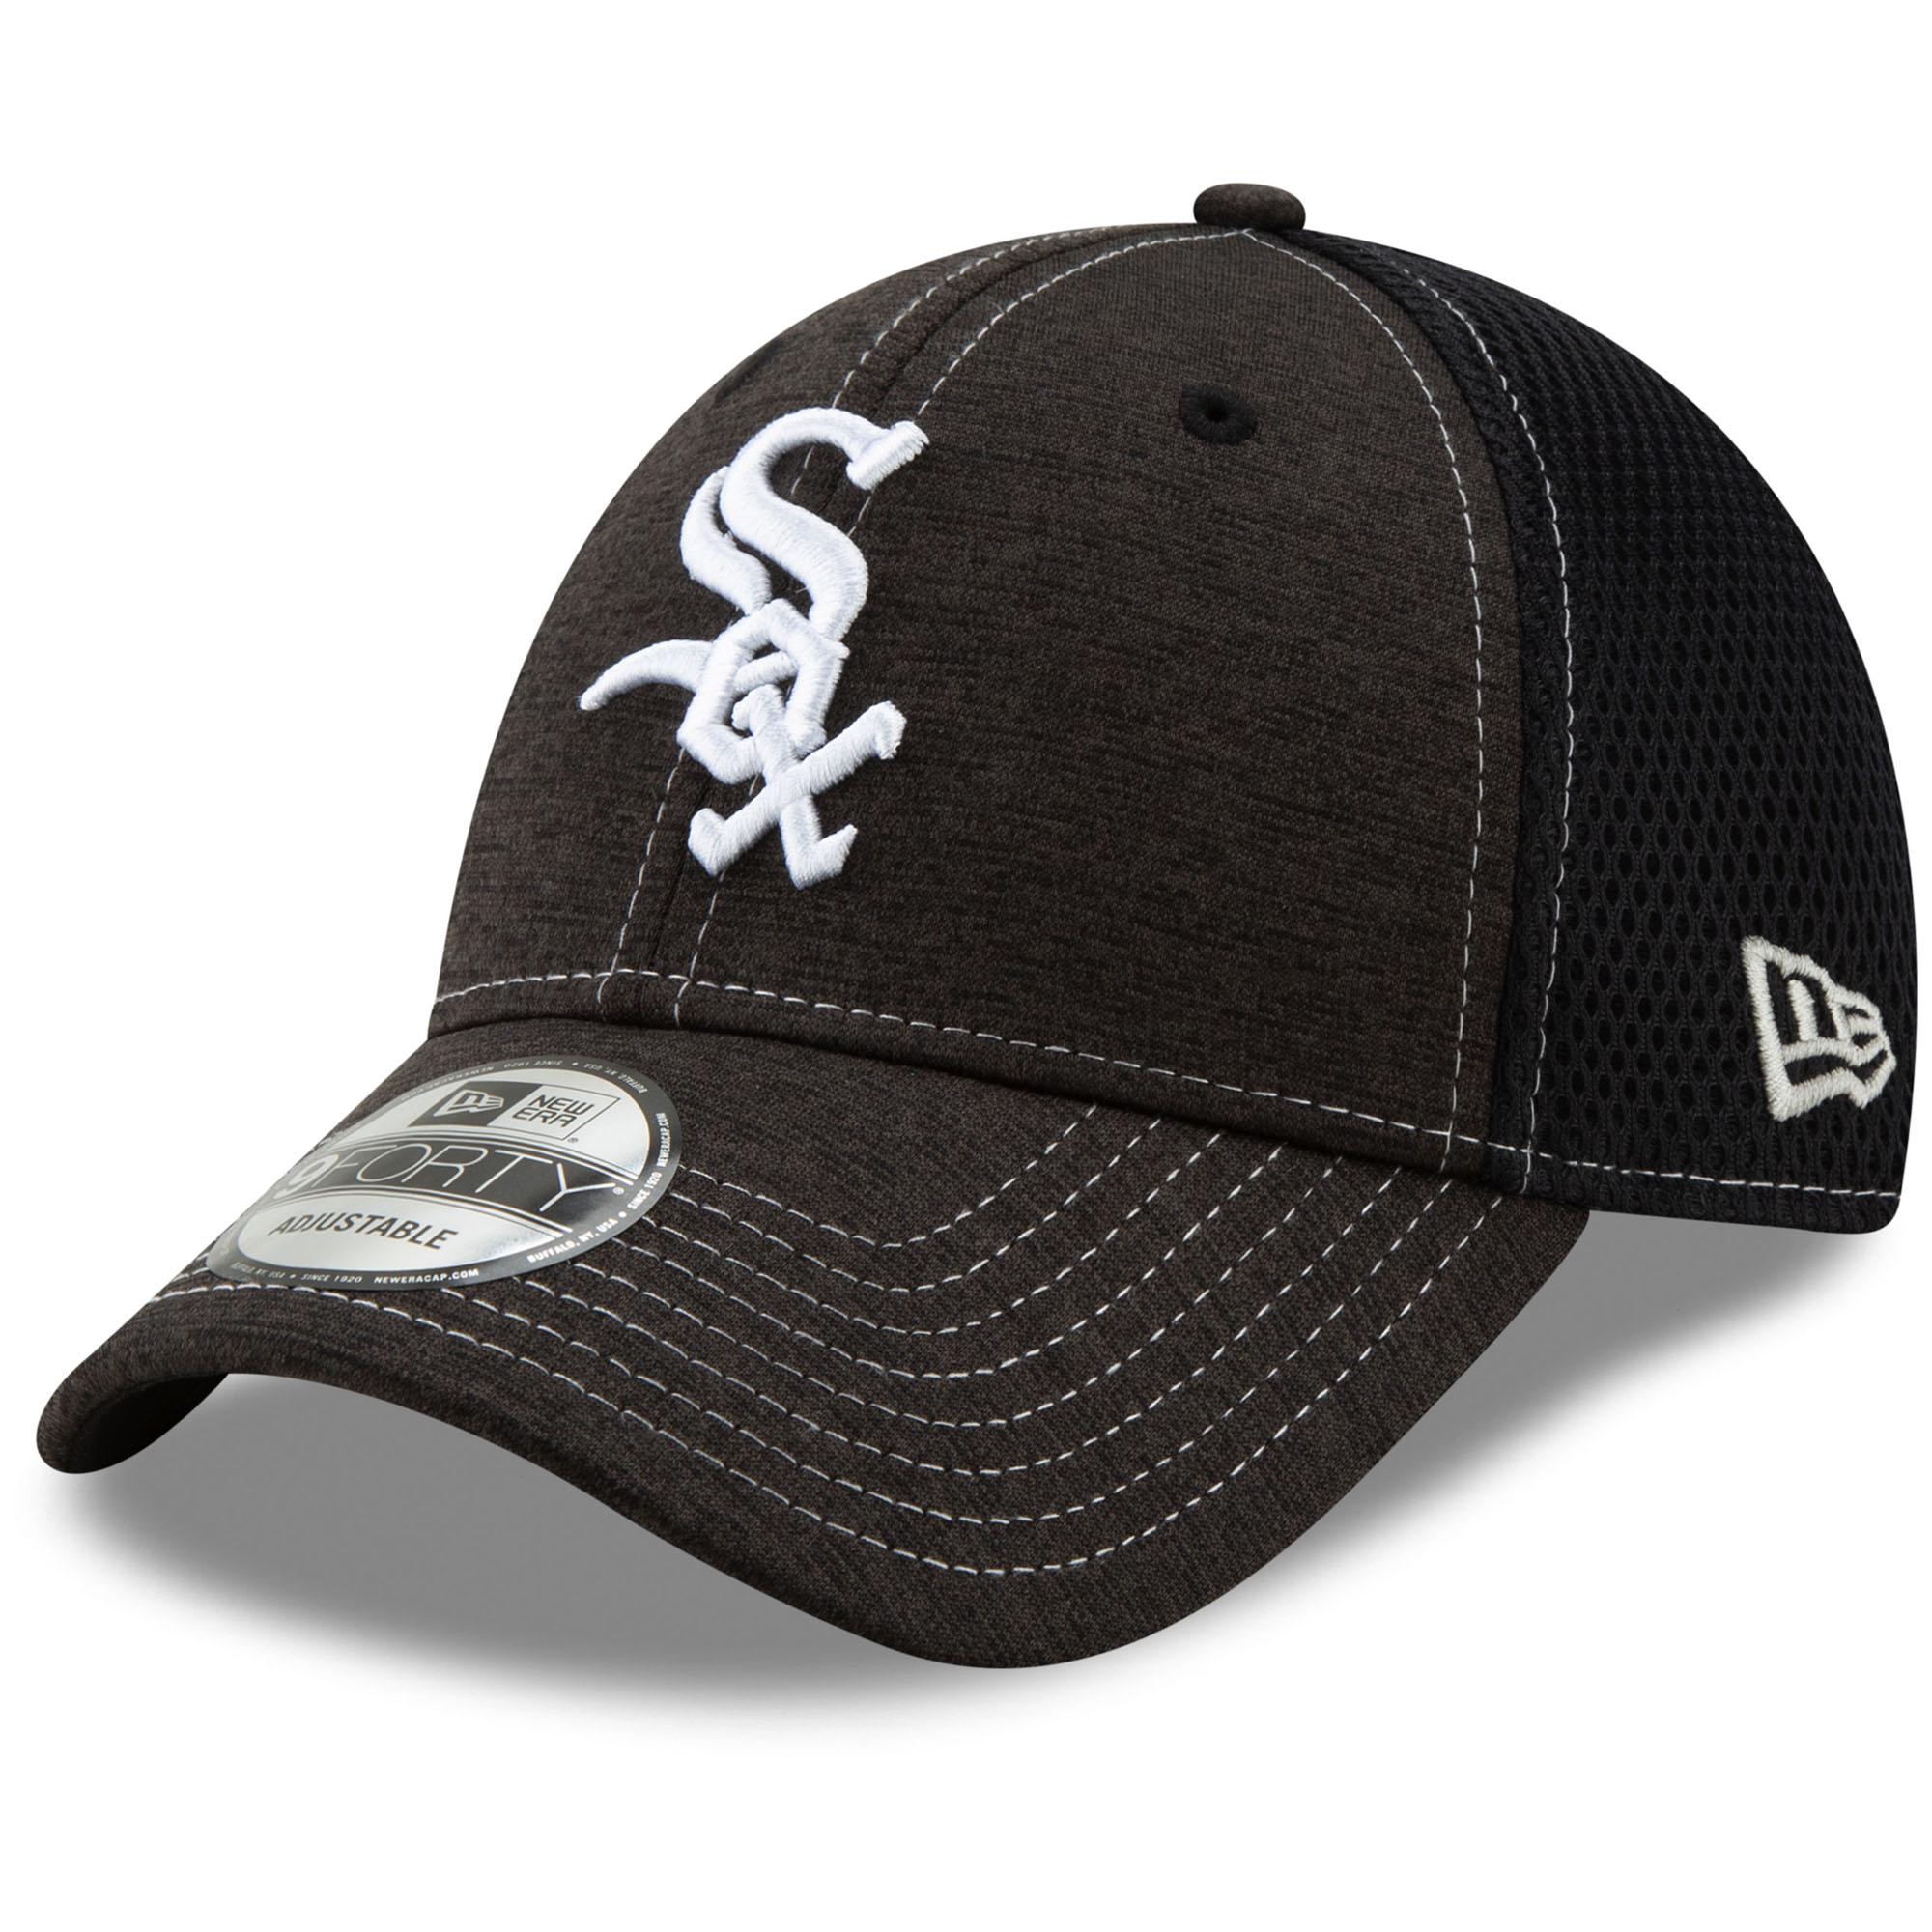 Chicago White Sox New Era Youth Team Tread 9FORTY Adjustable Hat - Black - OSFA